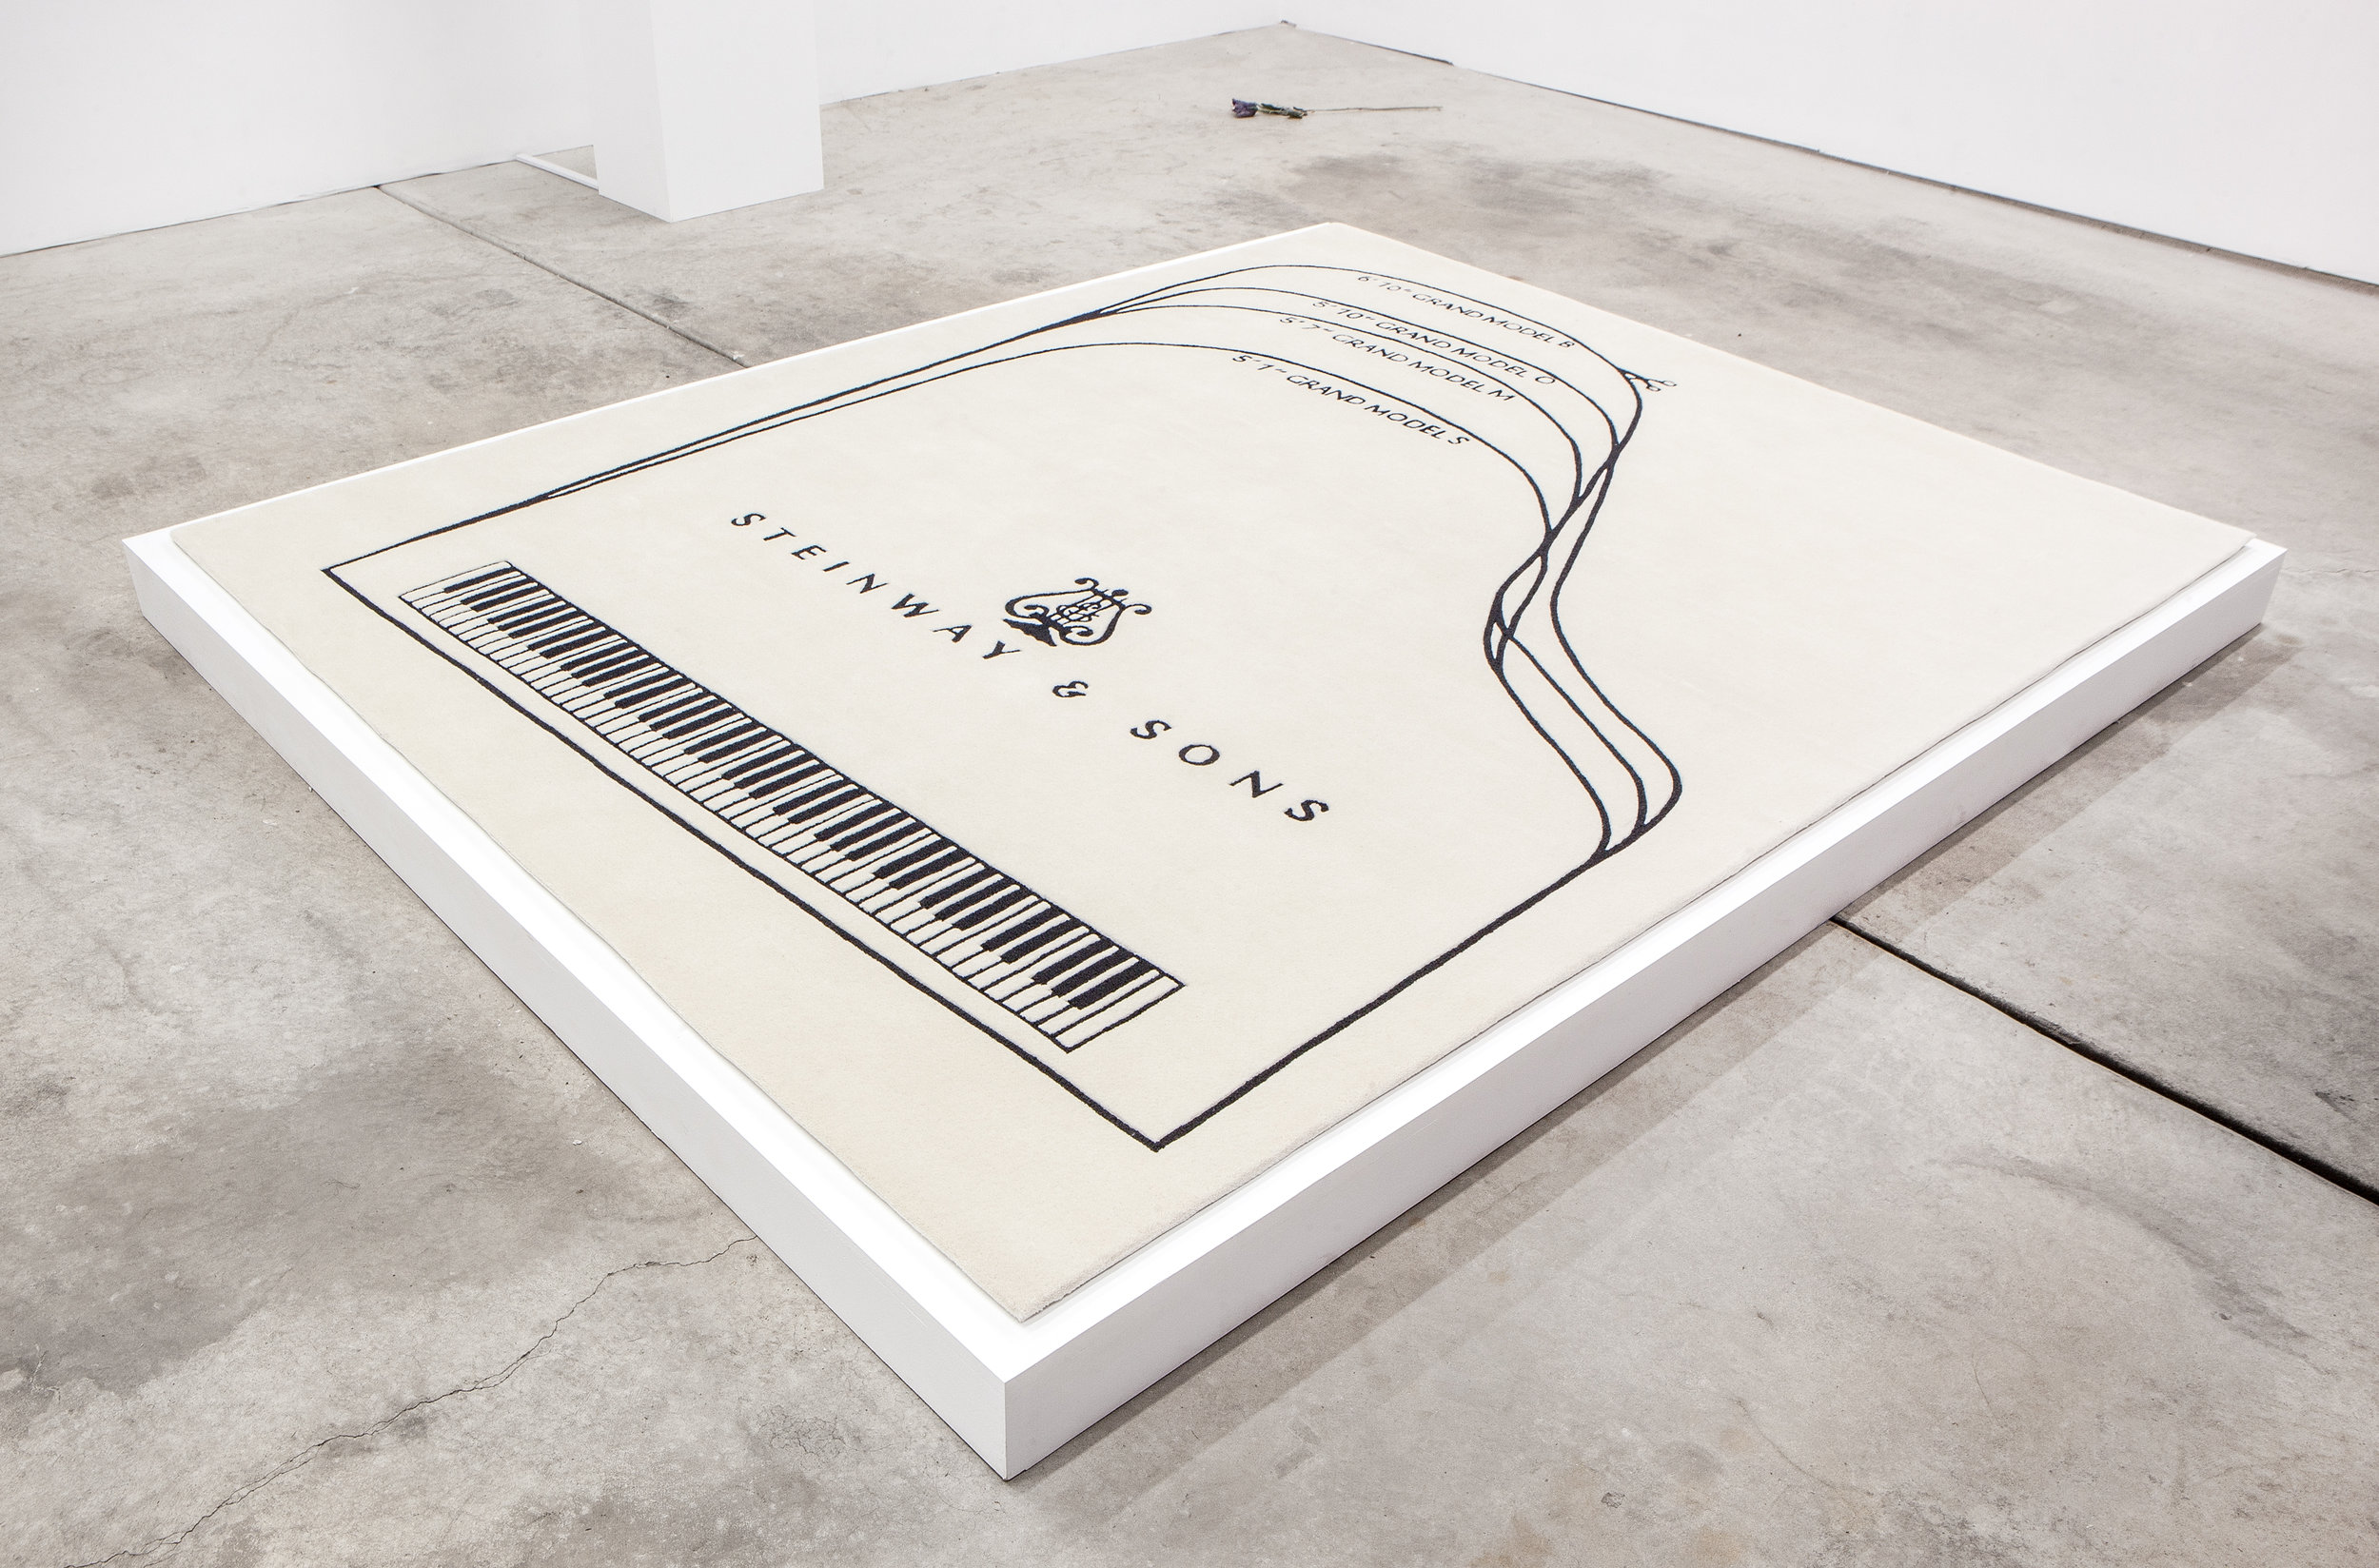 Barbara Bloom (b. Los Angeles, California, 1951),  Steinway Piano Carpet , 2010. Wool rug, 90 x 72 inches. Edition 6 of 15, with 2 AP. Courtesy David Lewis Gallery, New York. Photo: Daniel Hojnacki.